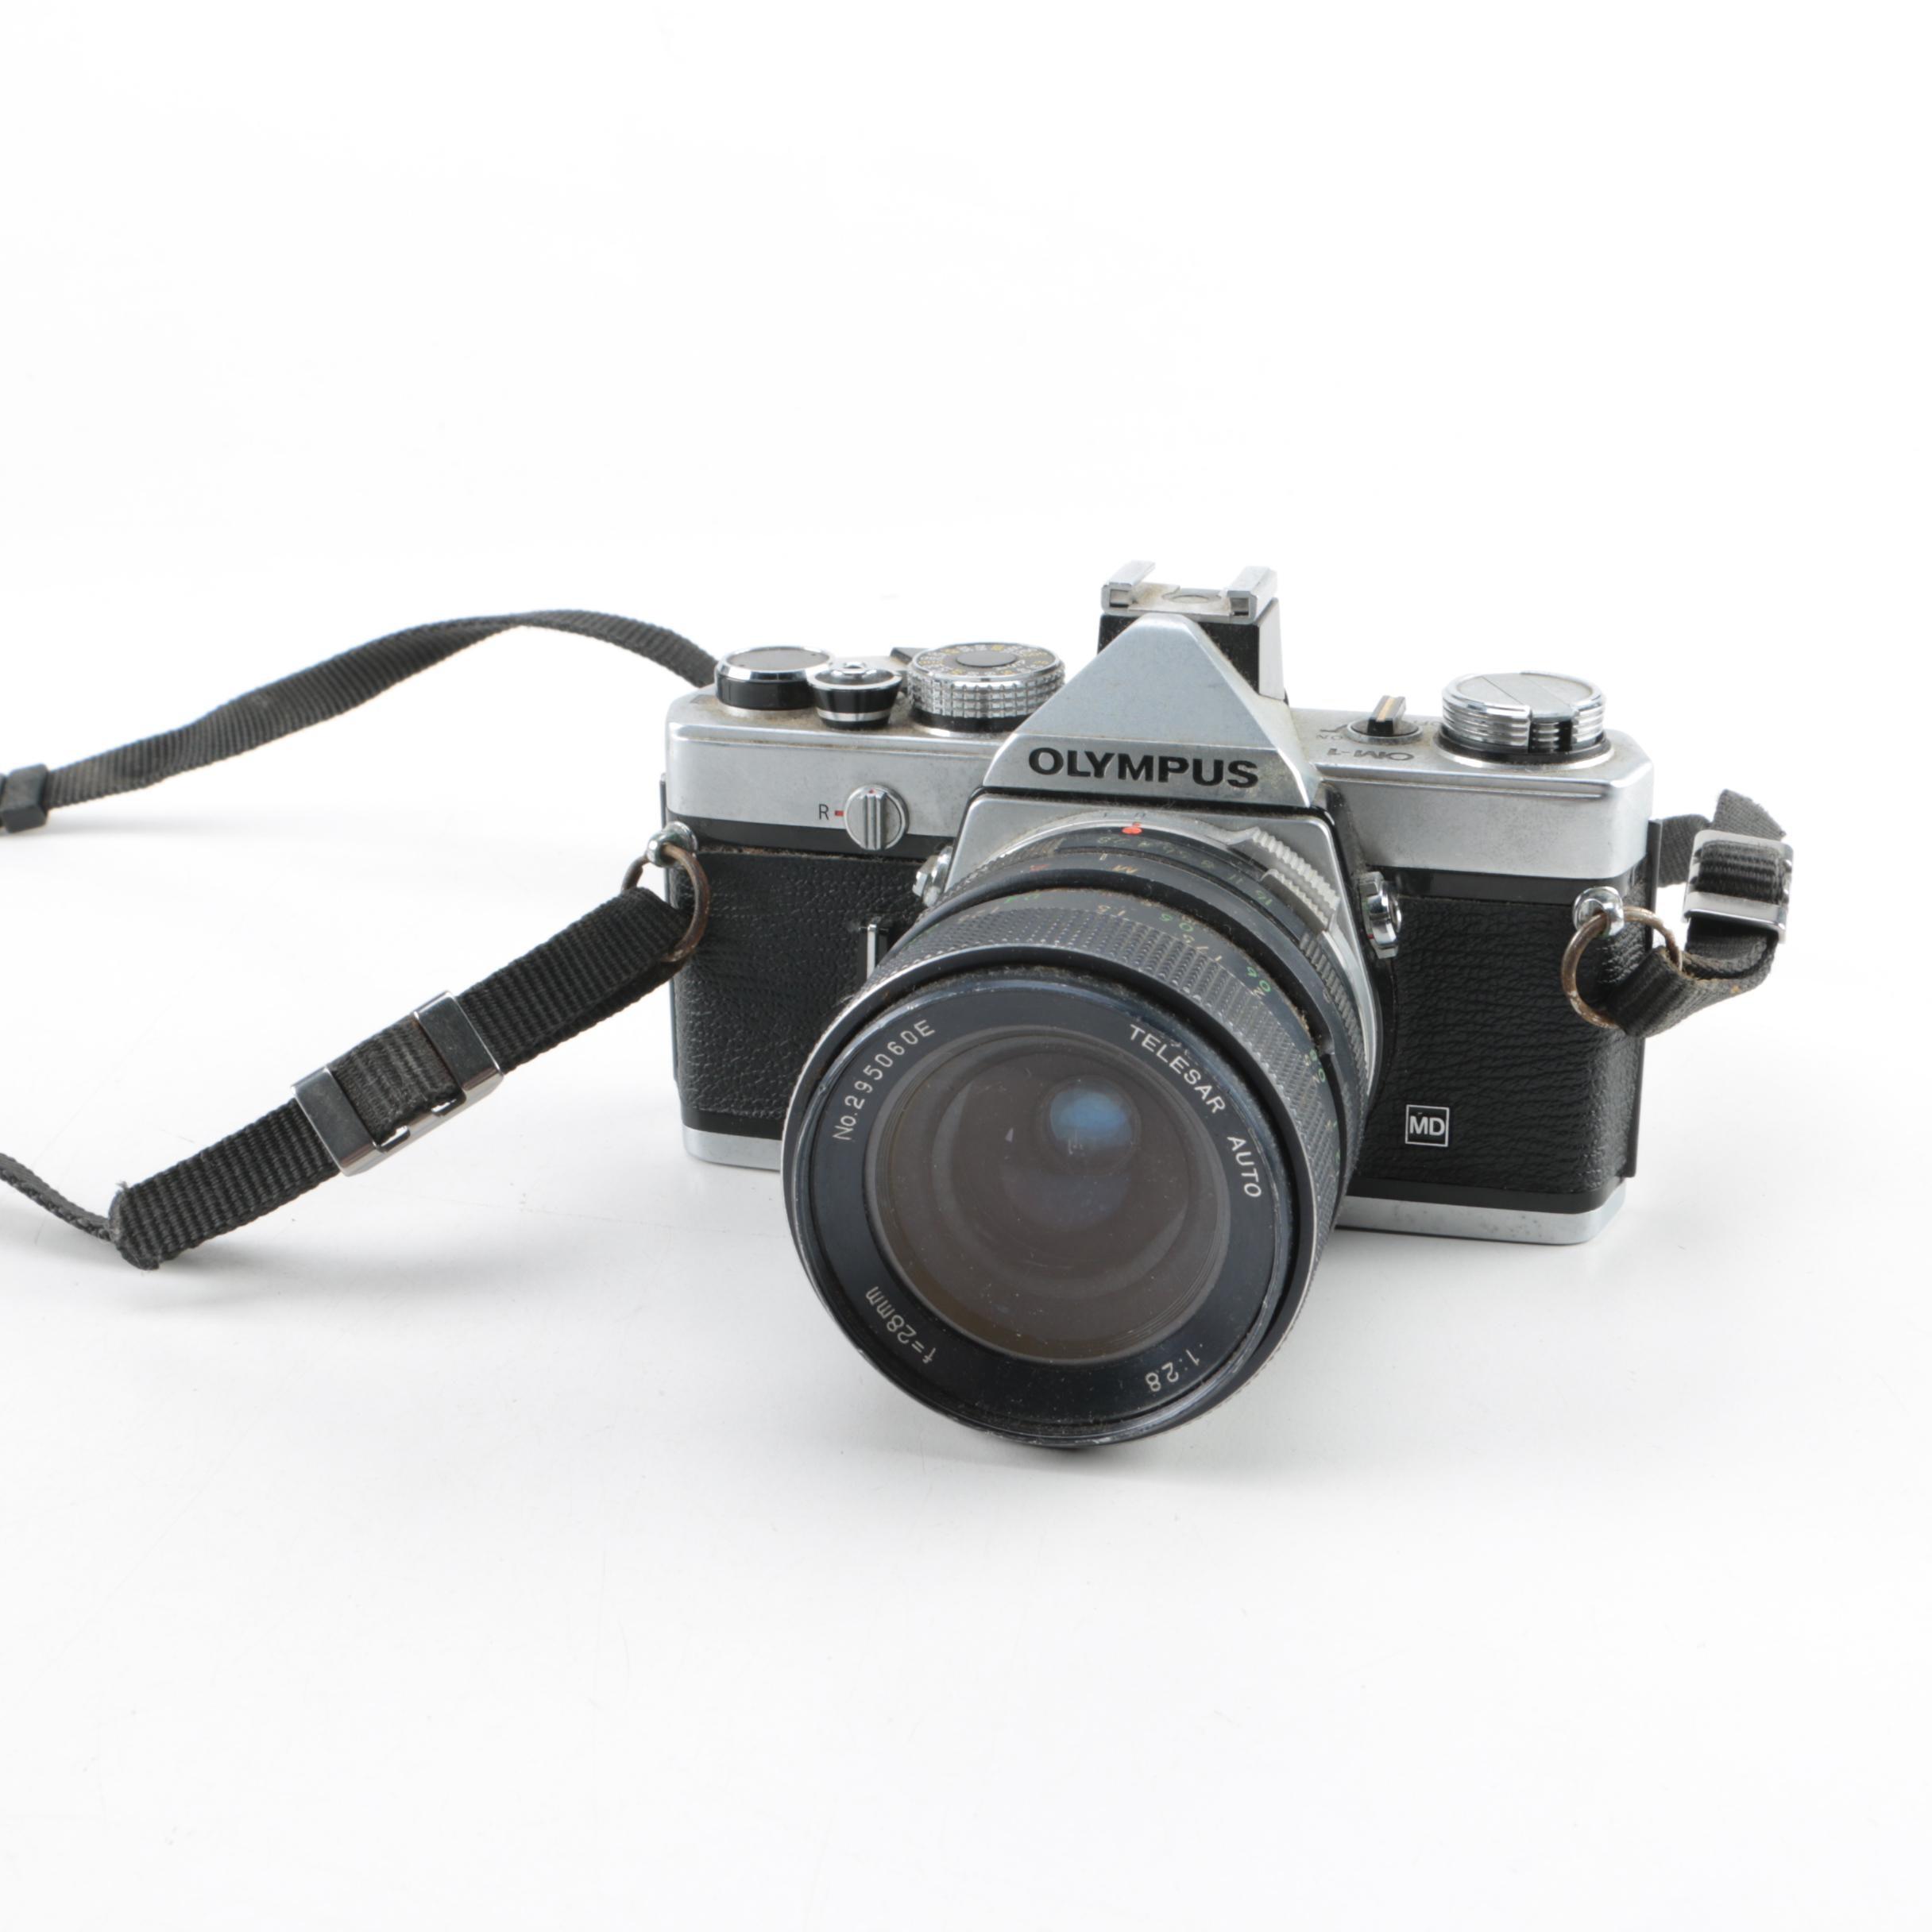 Olympus OM-1 Camera